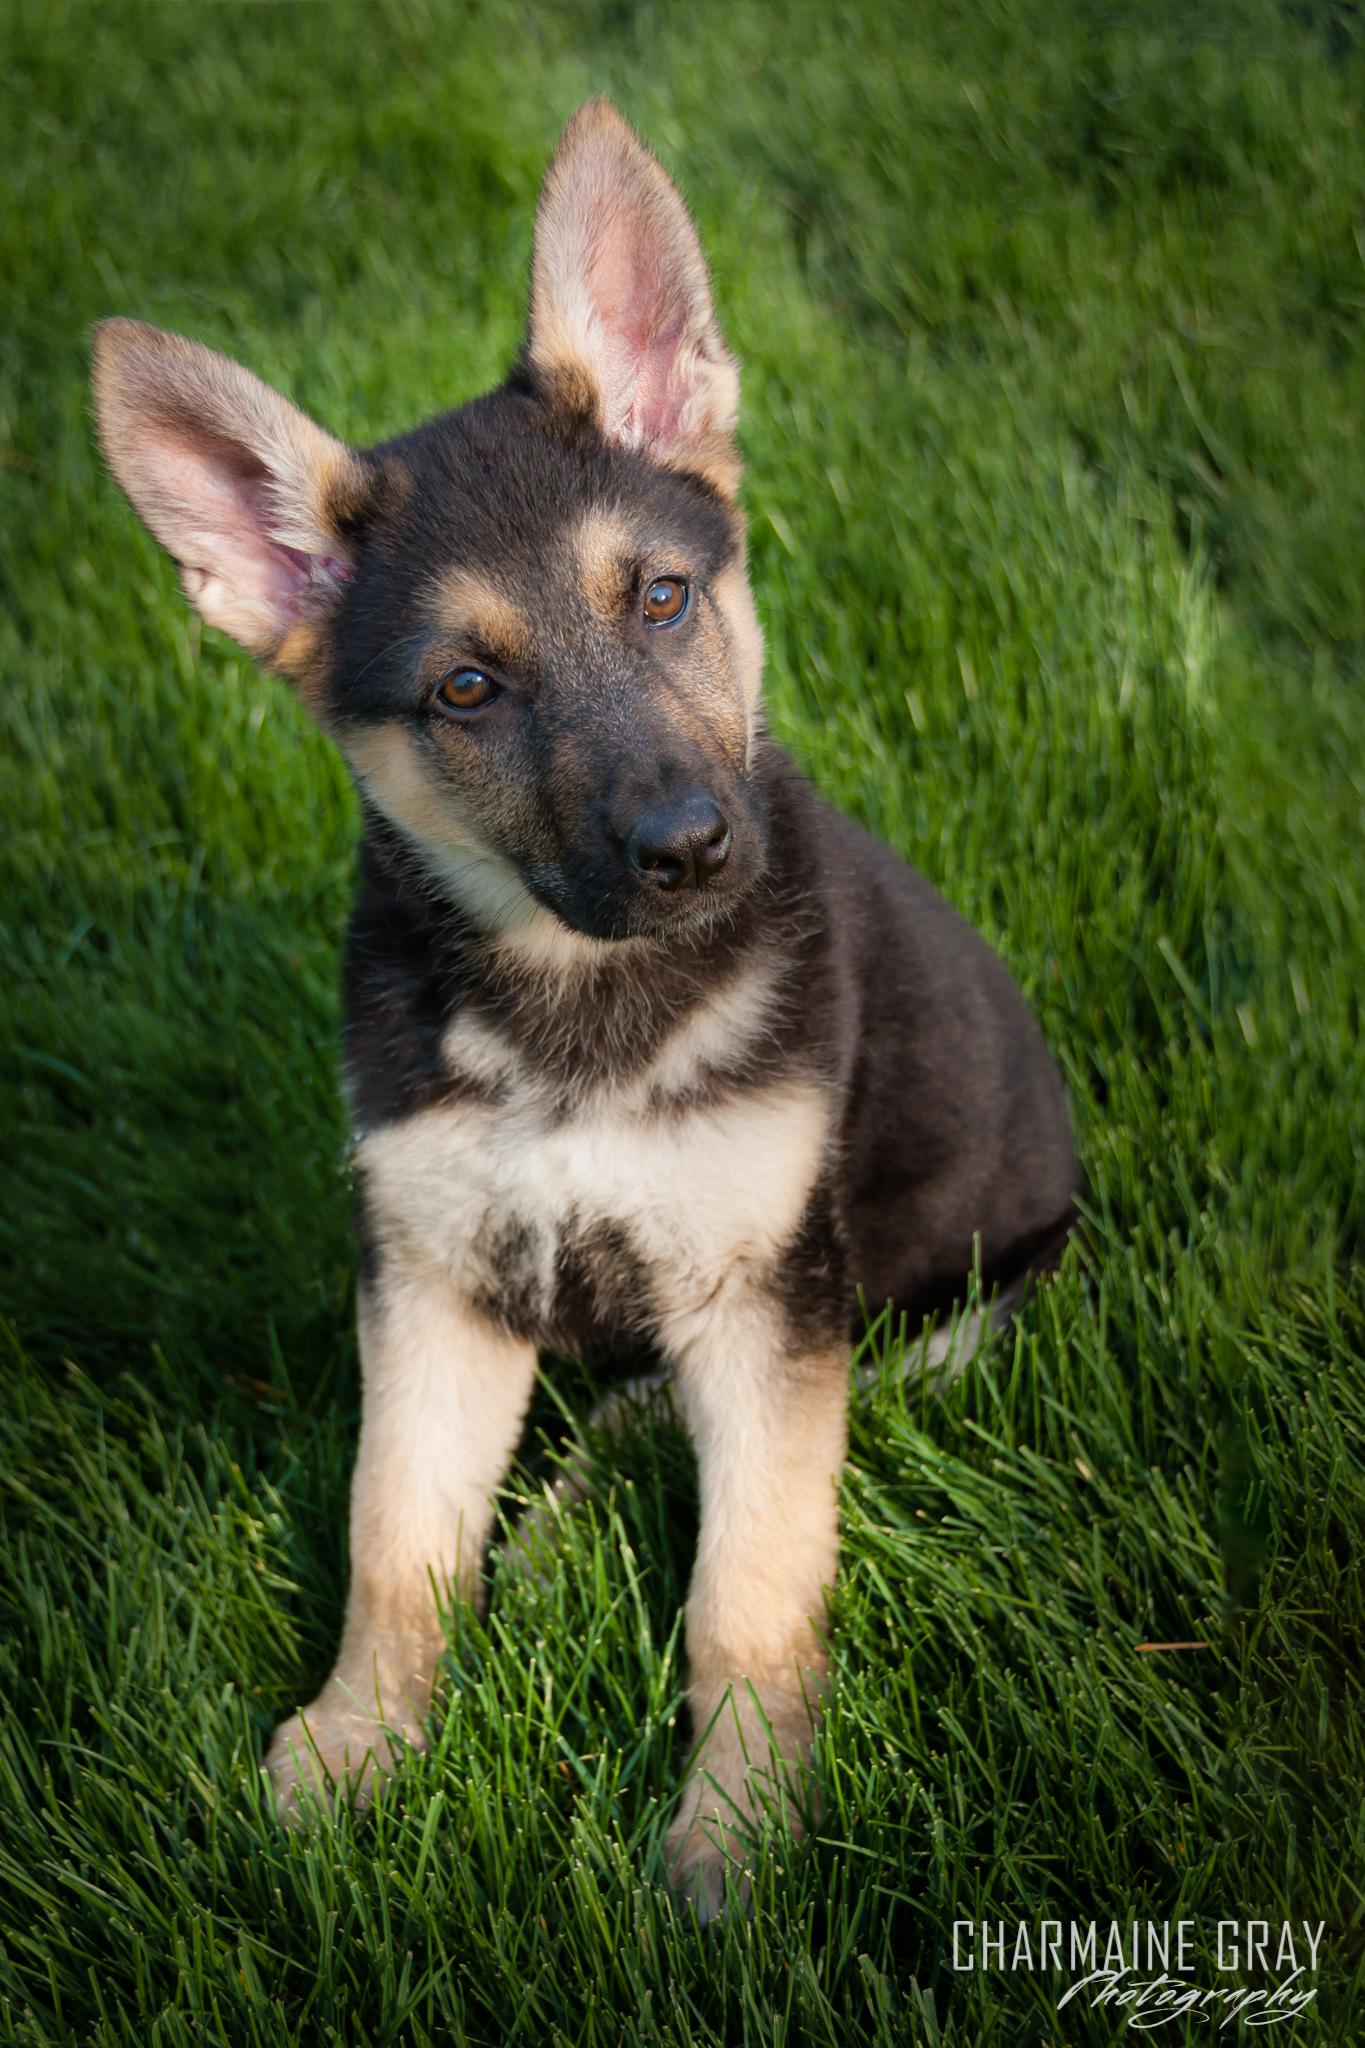 dog, pet photographer, pet photography, pet portrait, pet, animal, charmaine gray photography, charmaine gray pet photography, san diego,german shepherd,puppy